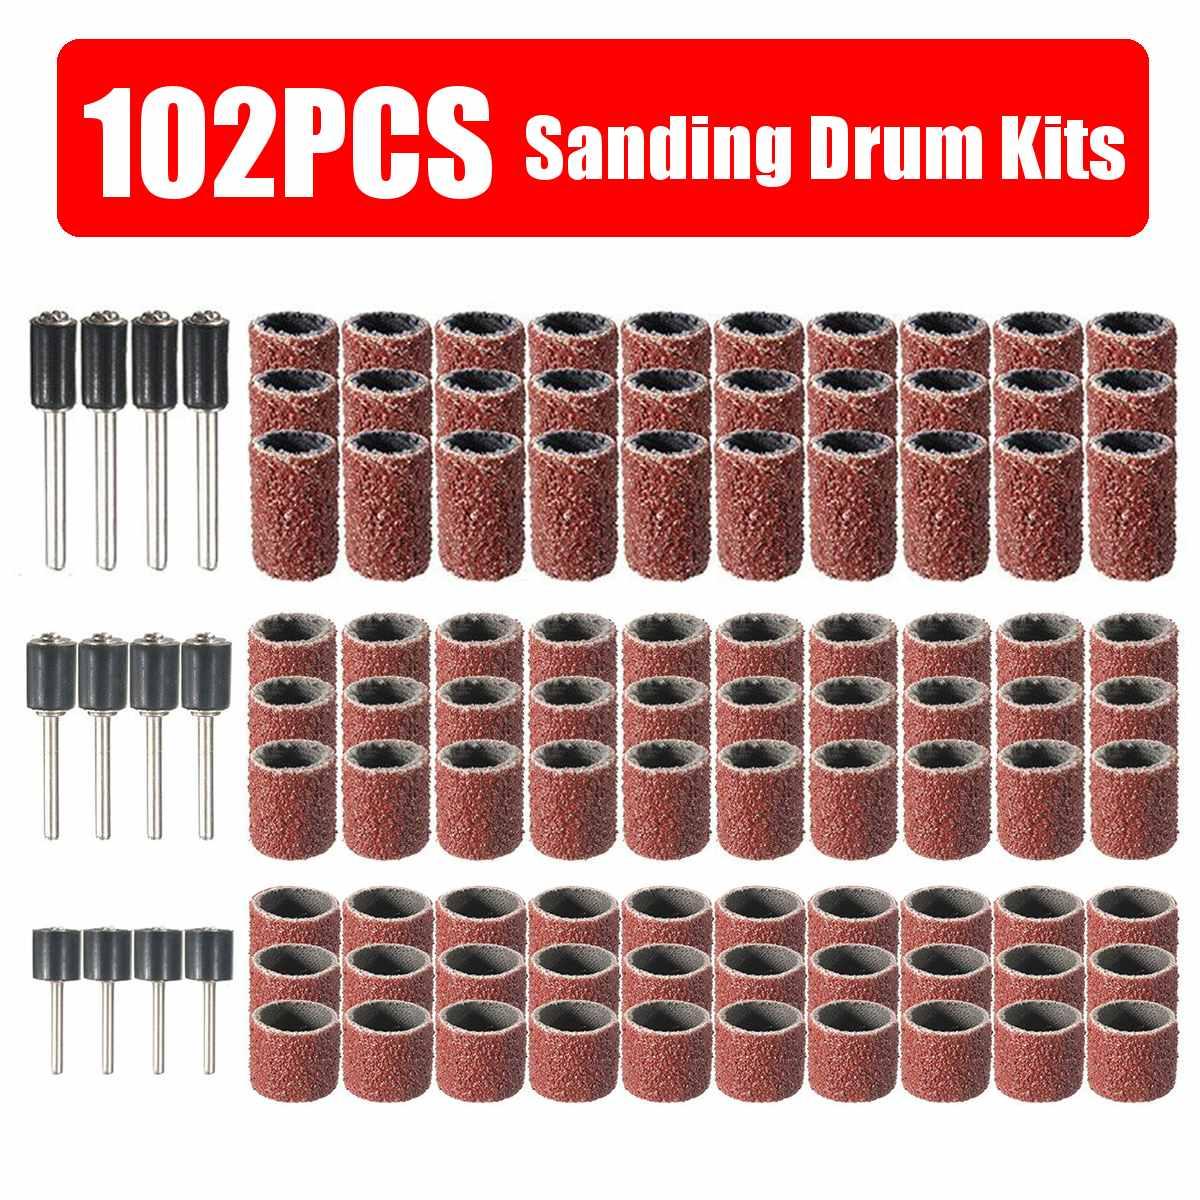 102pcs 120 Grit Drum Sanding Kit With 1//2 3//8 1//4 Inch Sanding Mandrels Fit Dremel Rotary Tools